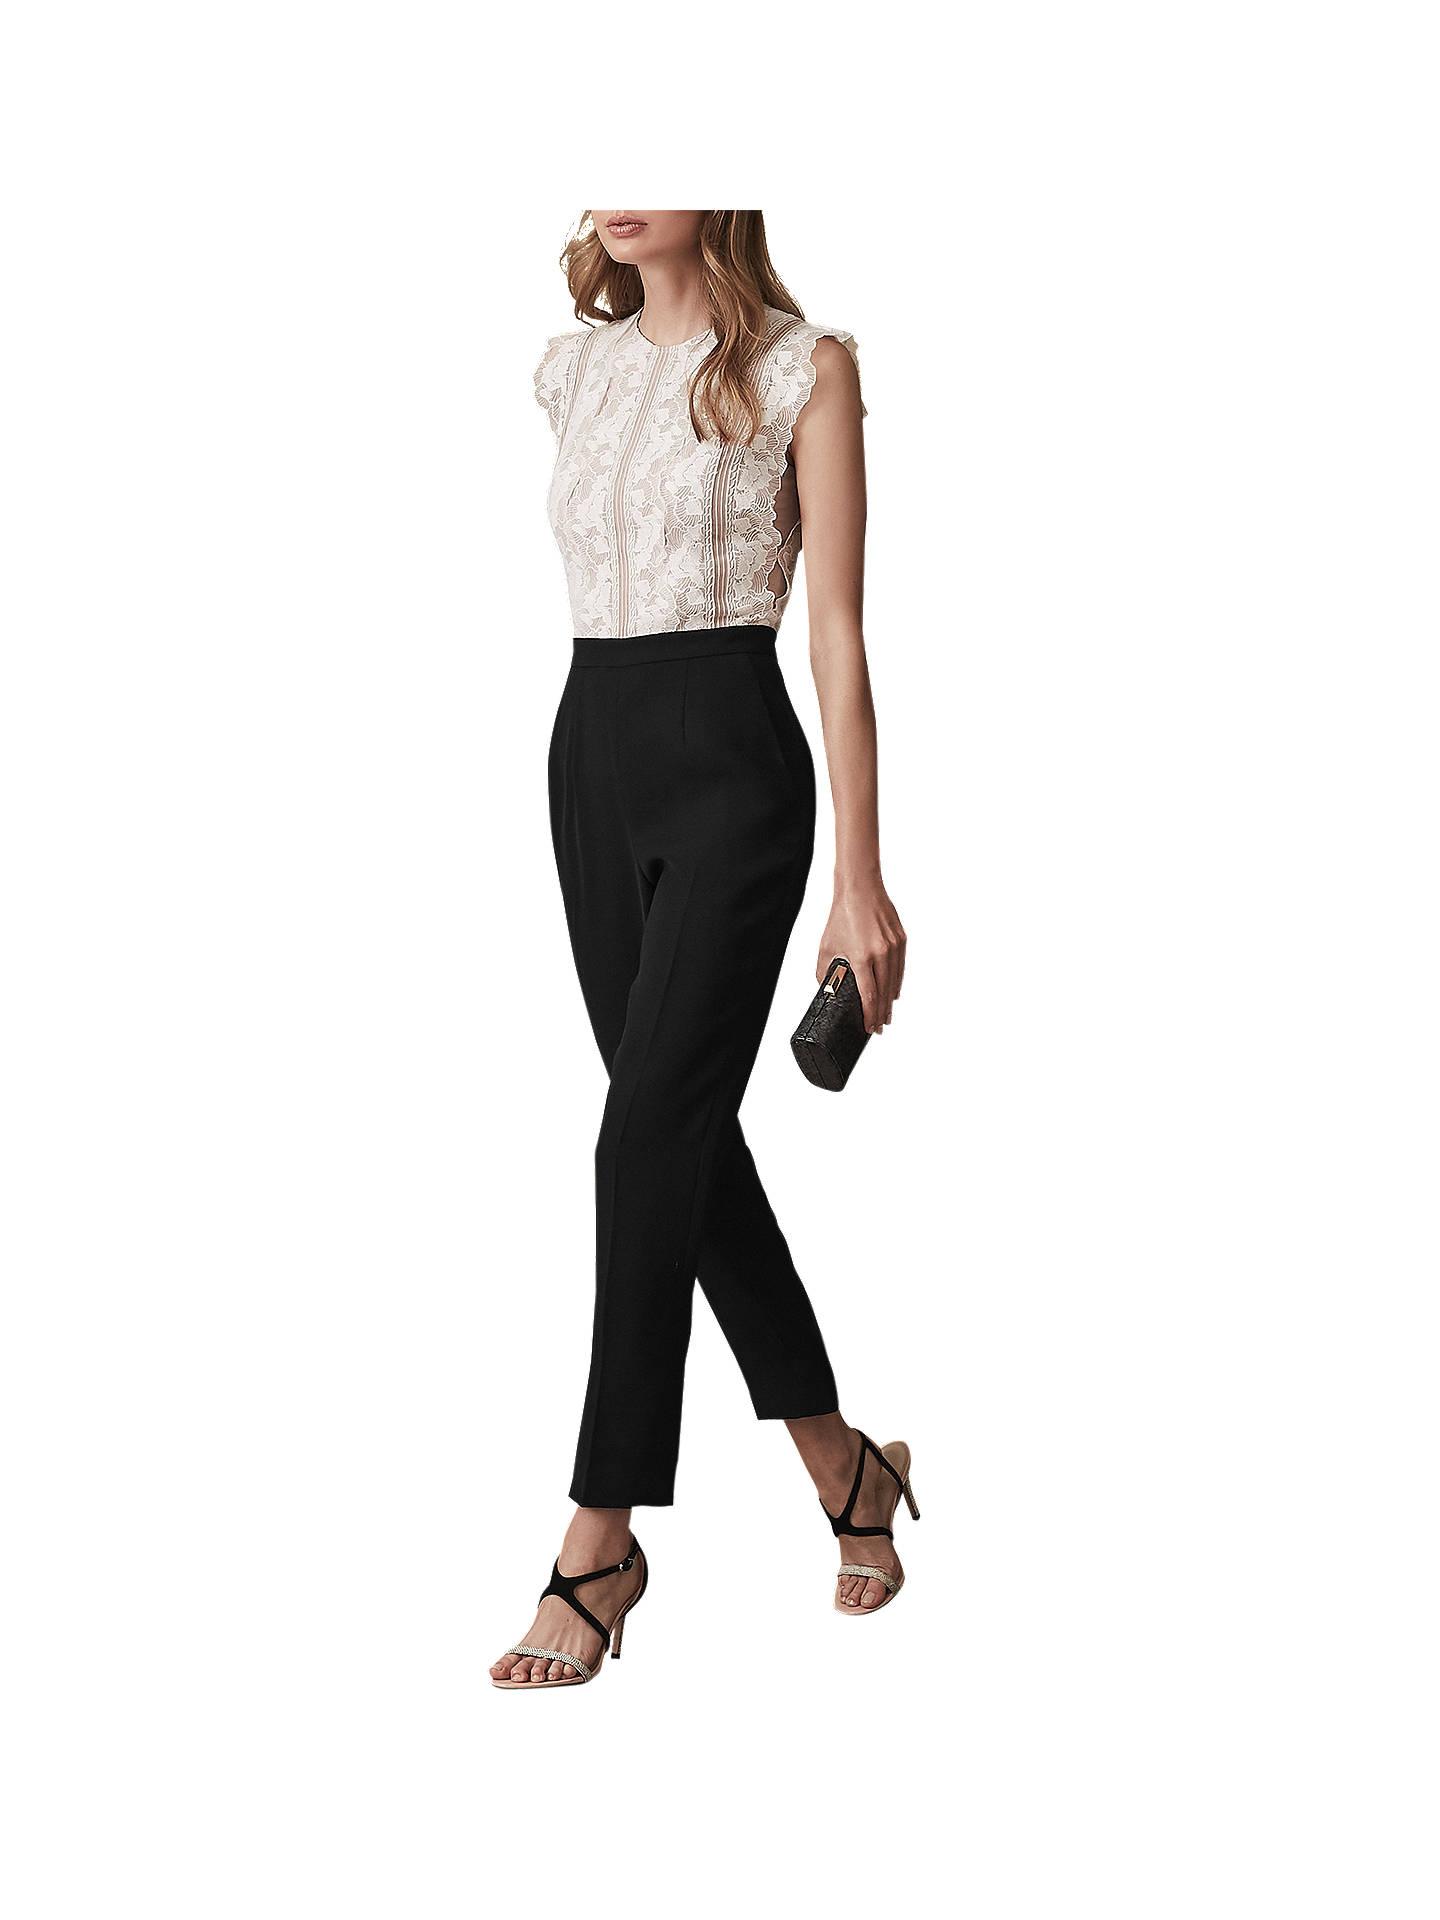 3436dab1a8a ... Buy Reiss Suzy Lace Jumpsuit